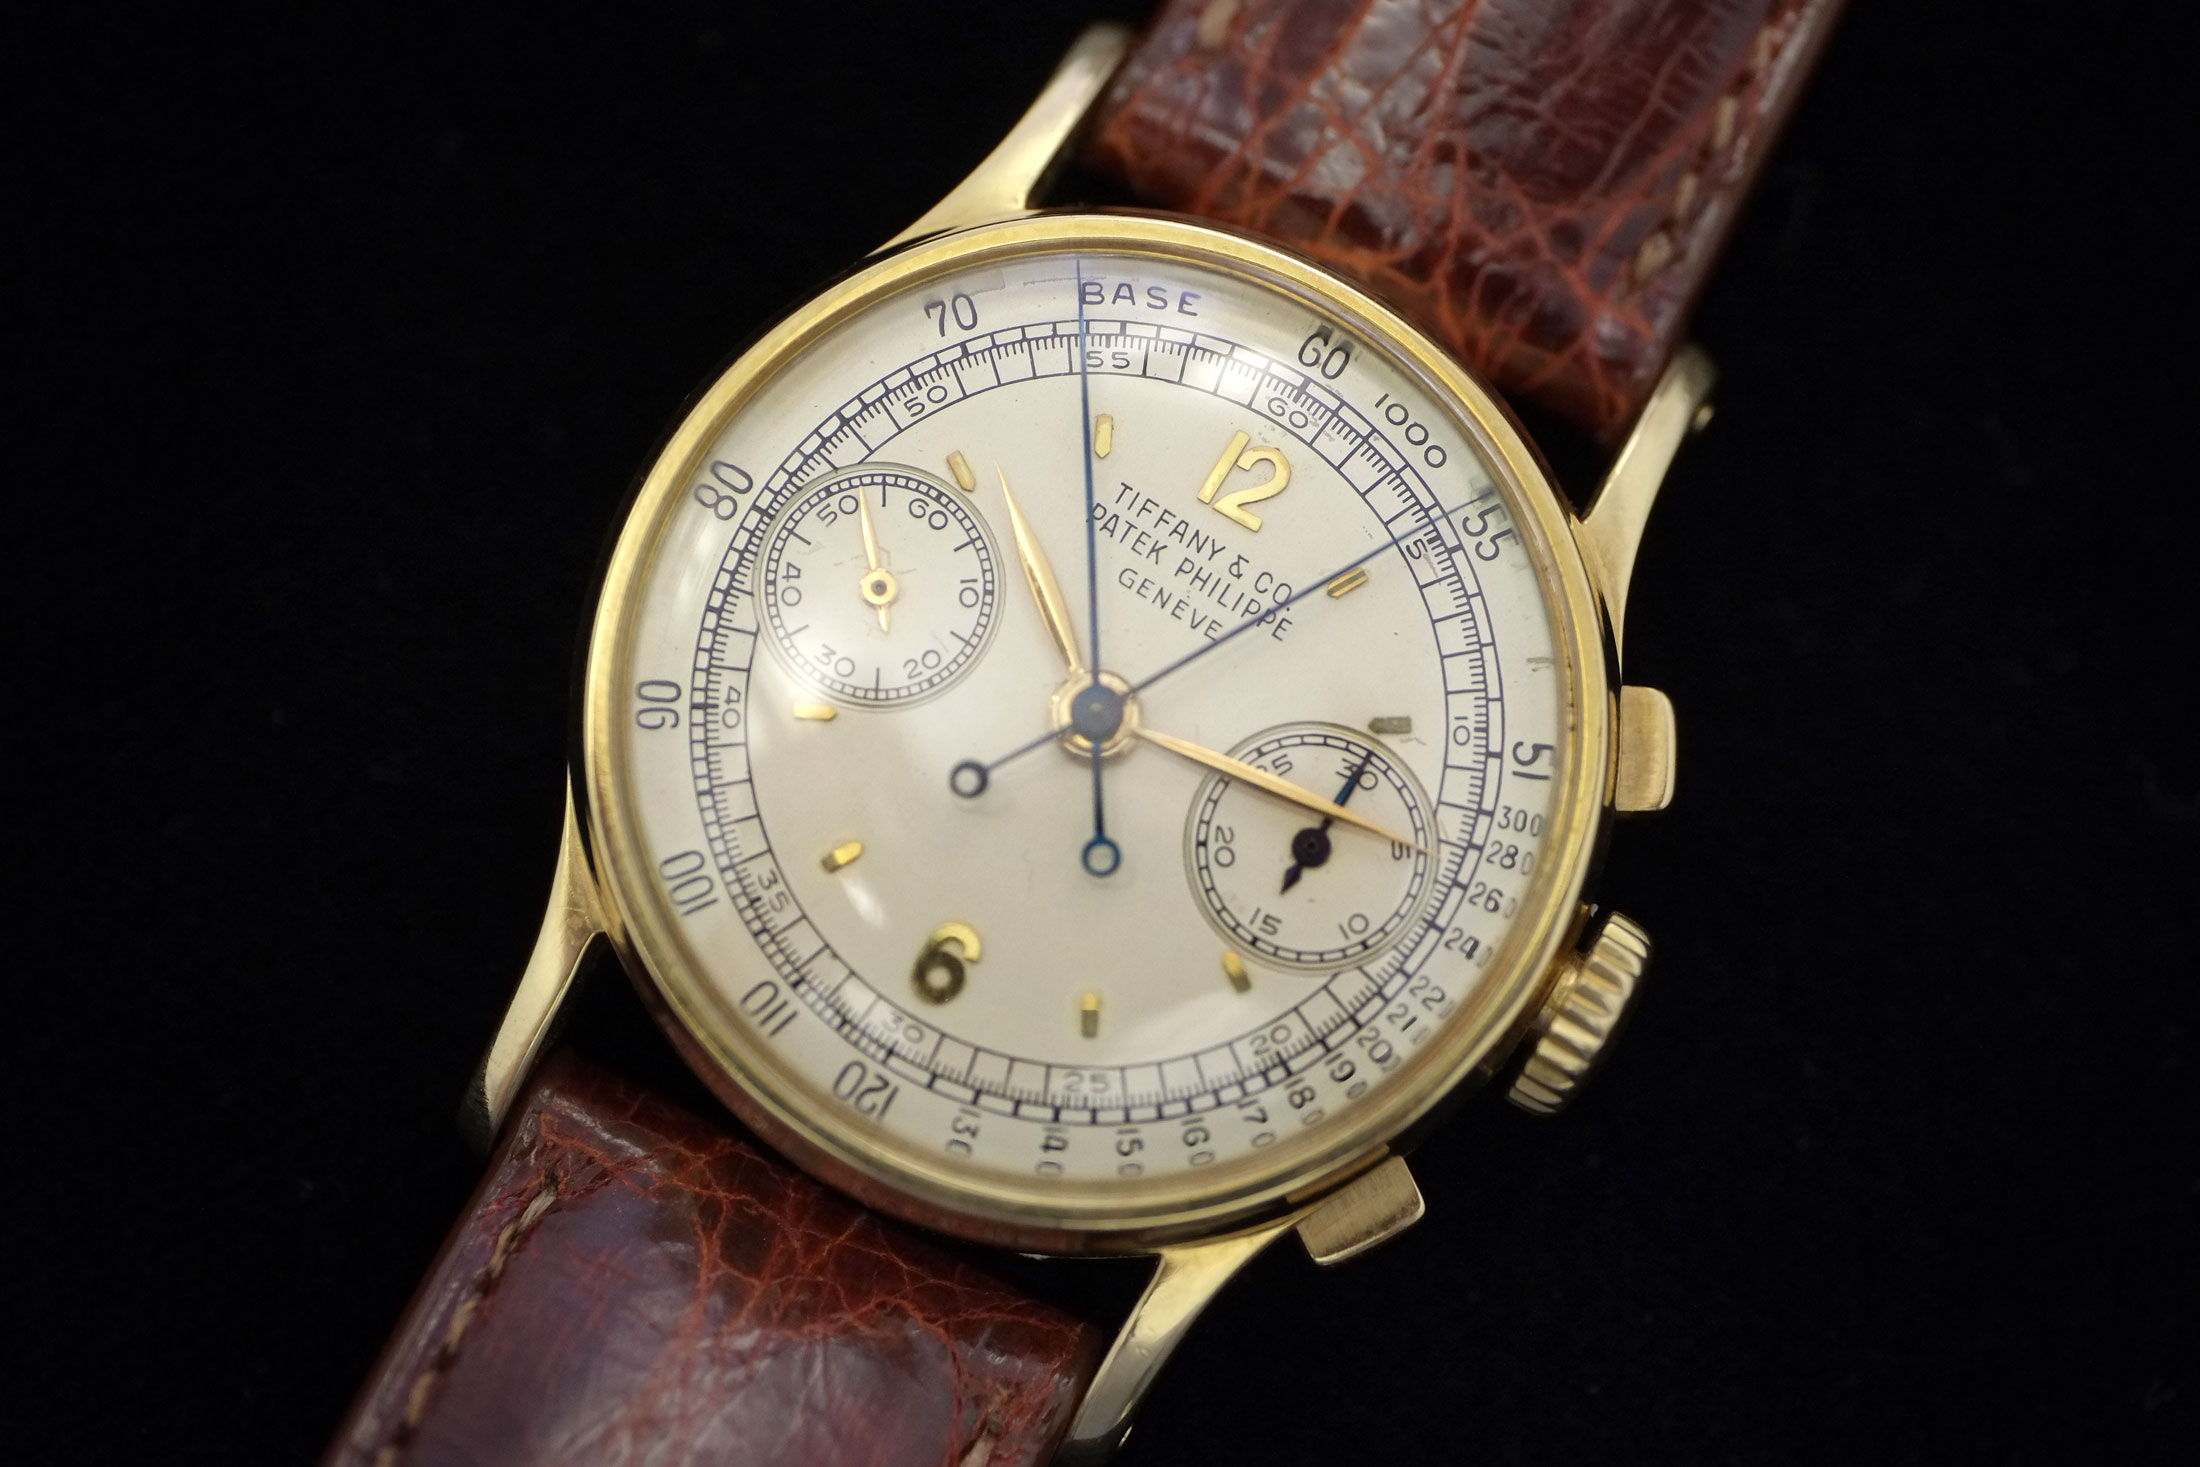 Patek Philippe ref. 1436 Split Seconds Chronograph (lot 47)